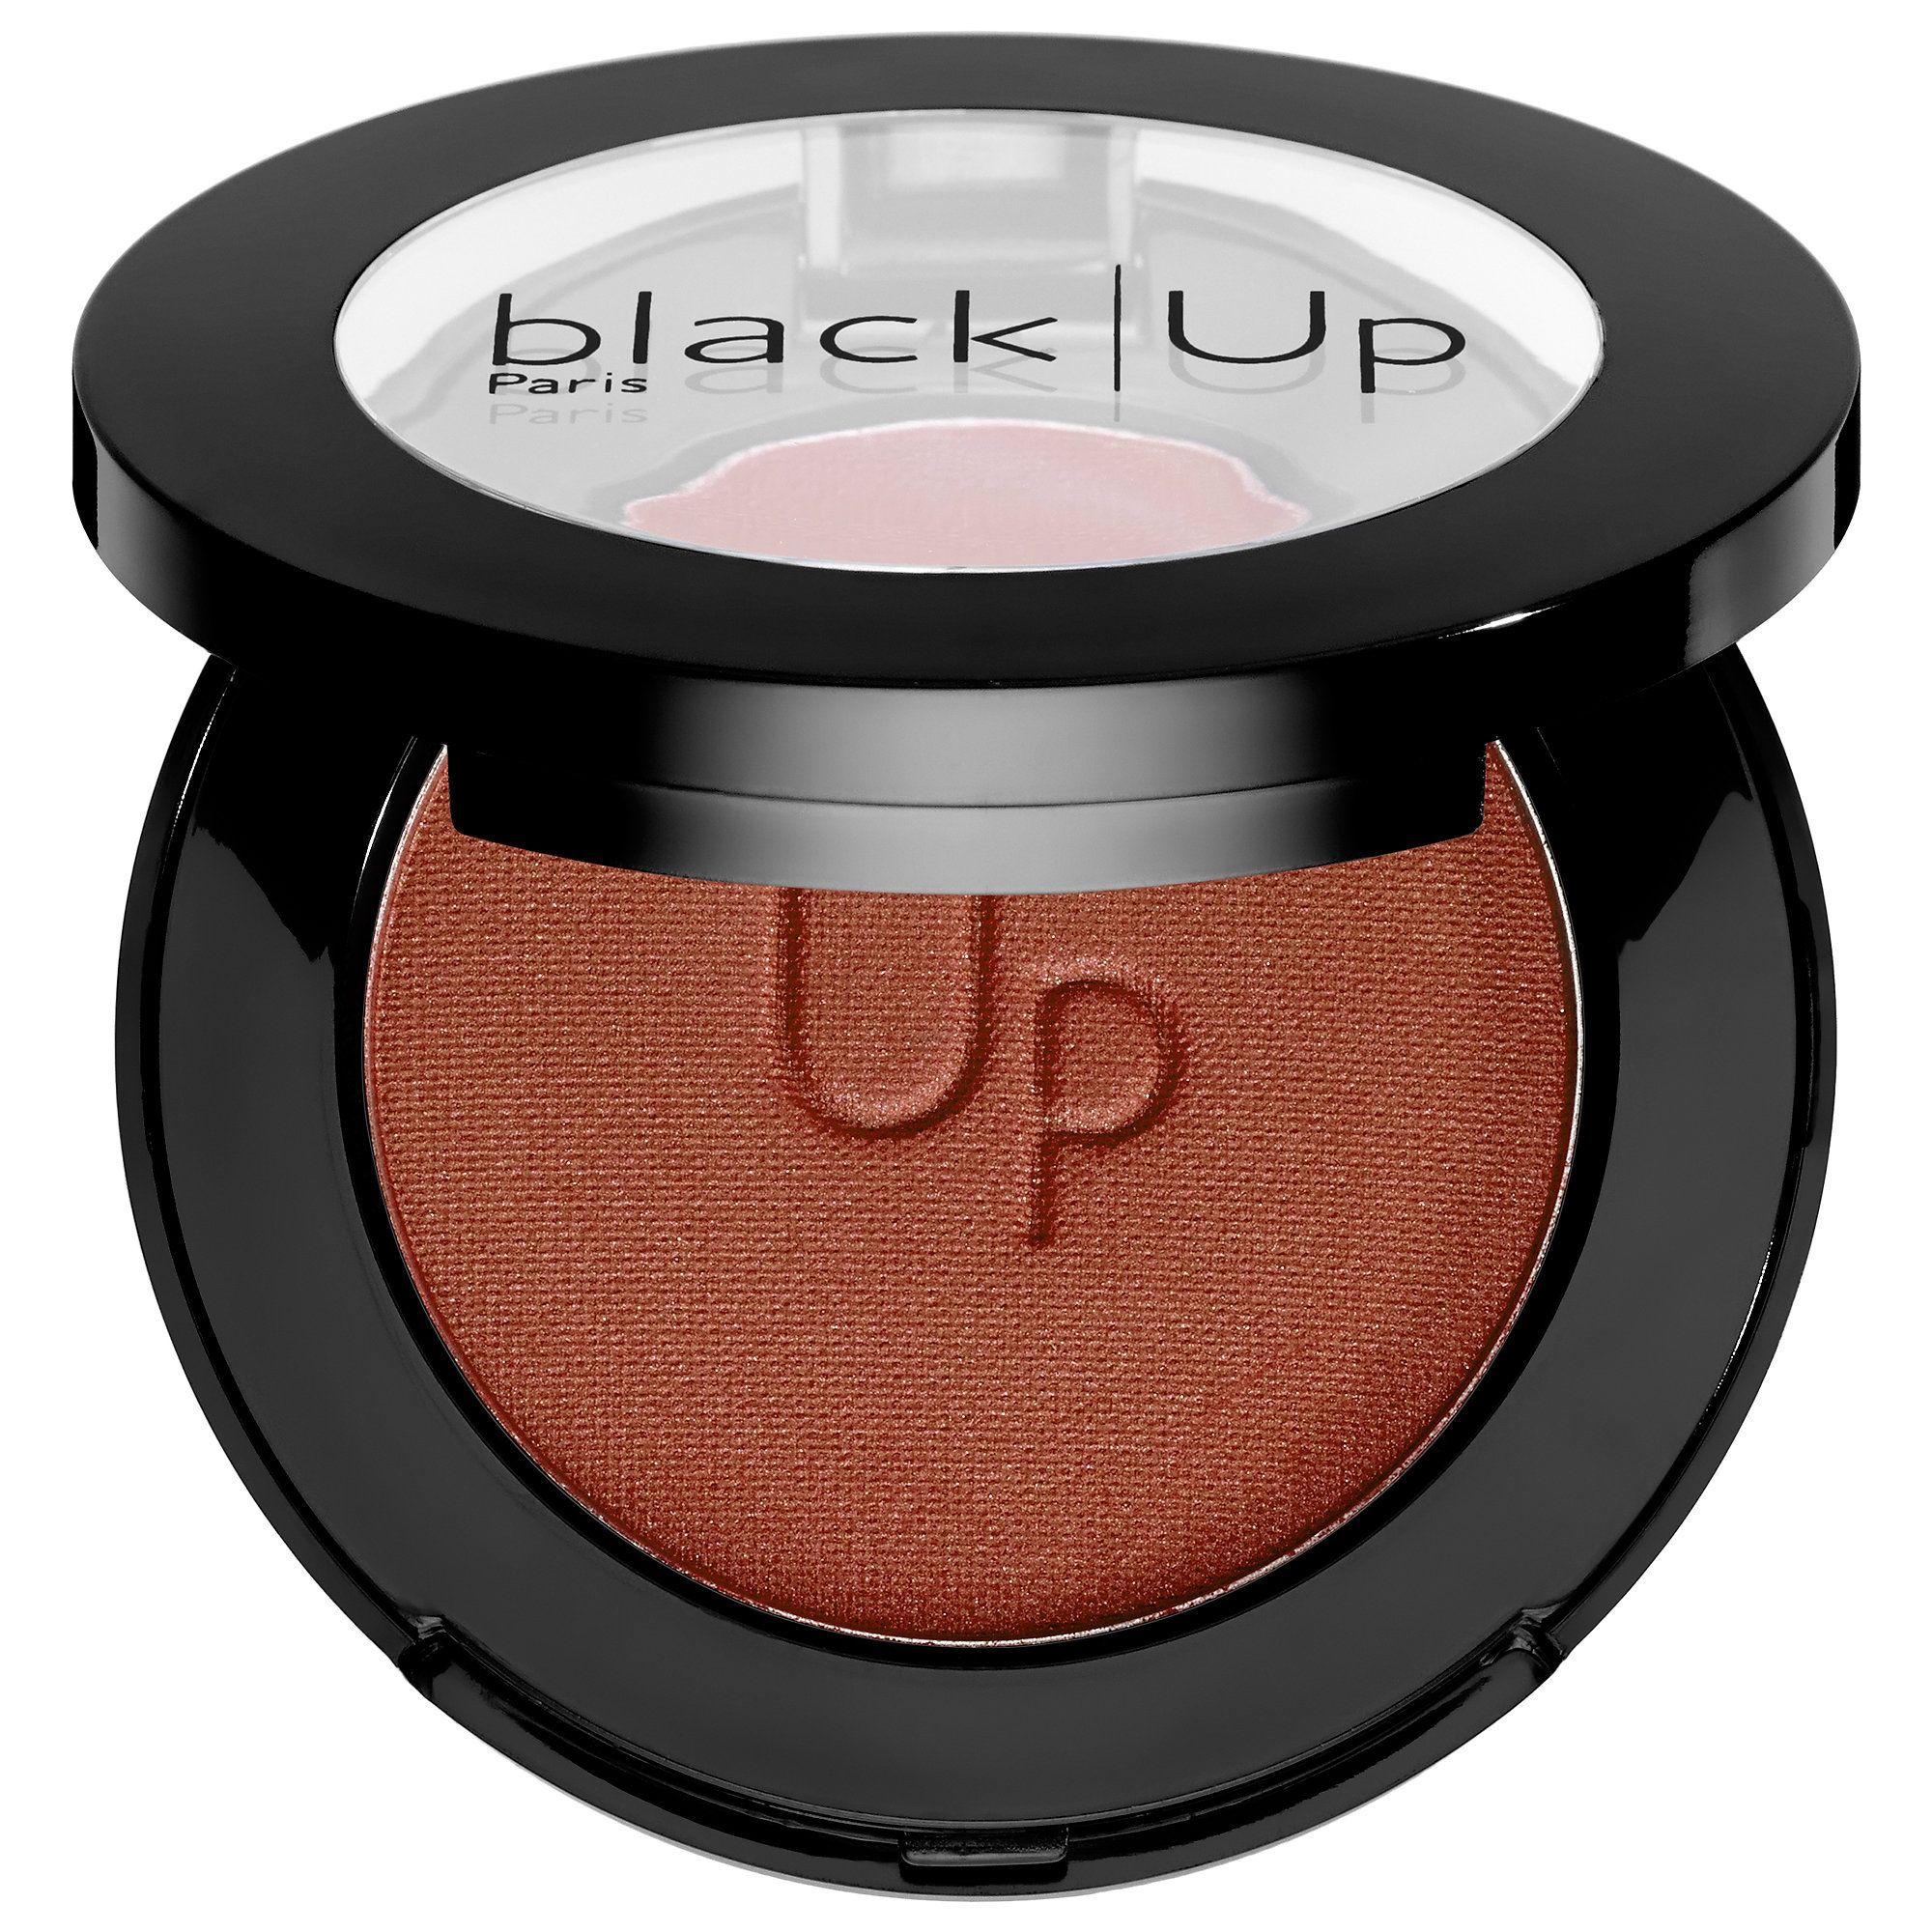 black Up's Blush nbl10 cocoa Orange makeup, Blush, Eyeshadow